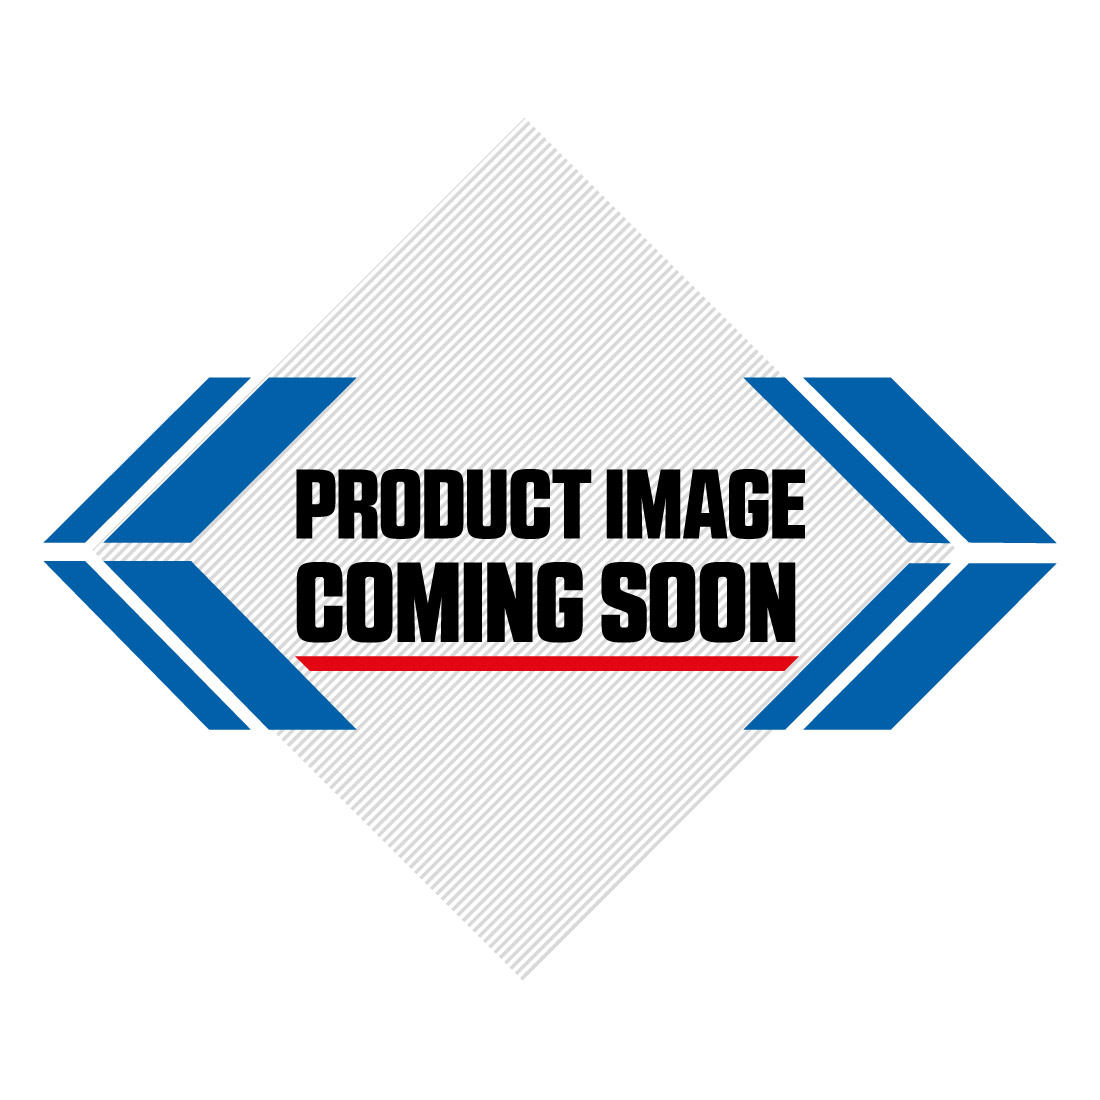 Suzuki Plastic Kit RMZ 450 (08-17) OEM Factory Image-4>